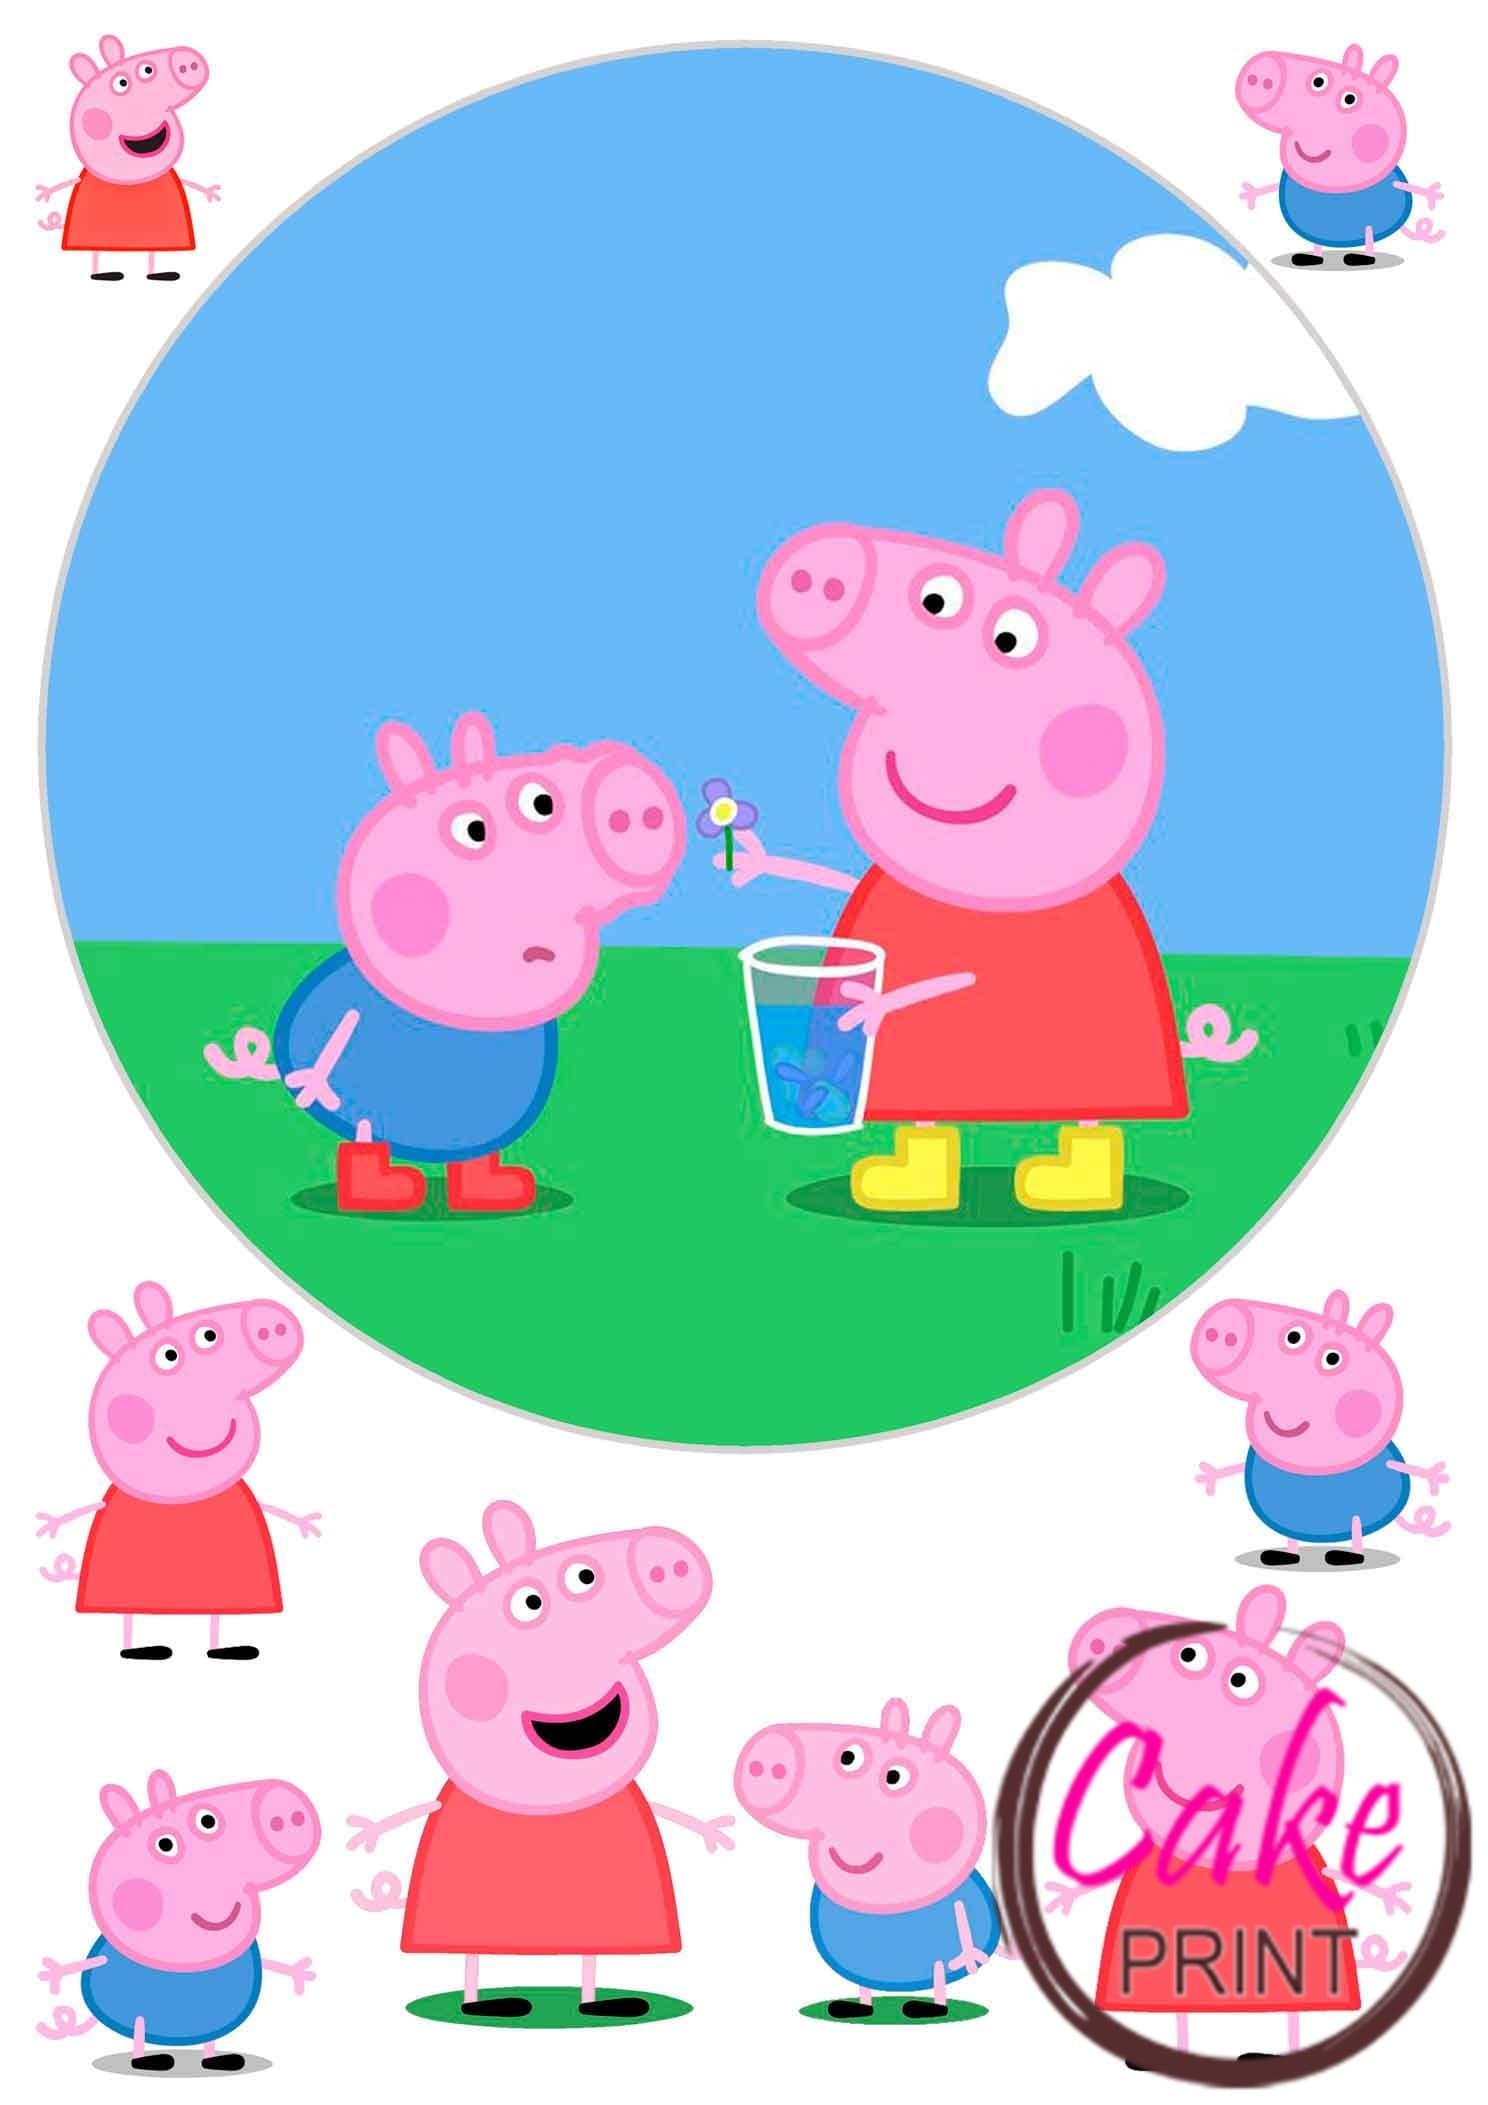 Вафельная картинка «Свинка Пеппа» №004 - на торт, мафин ...